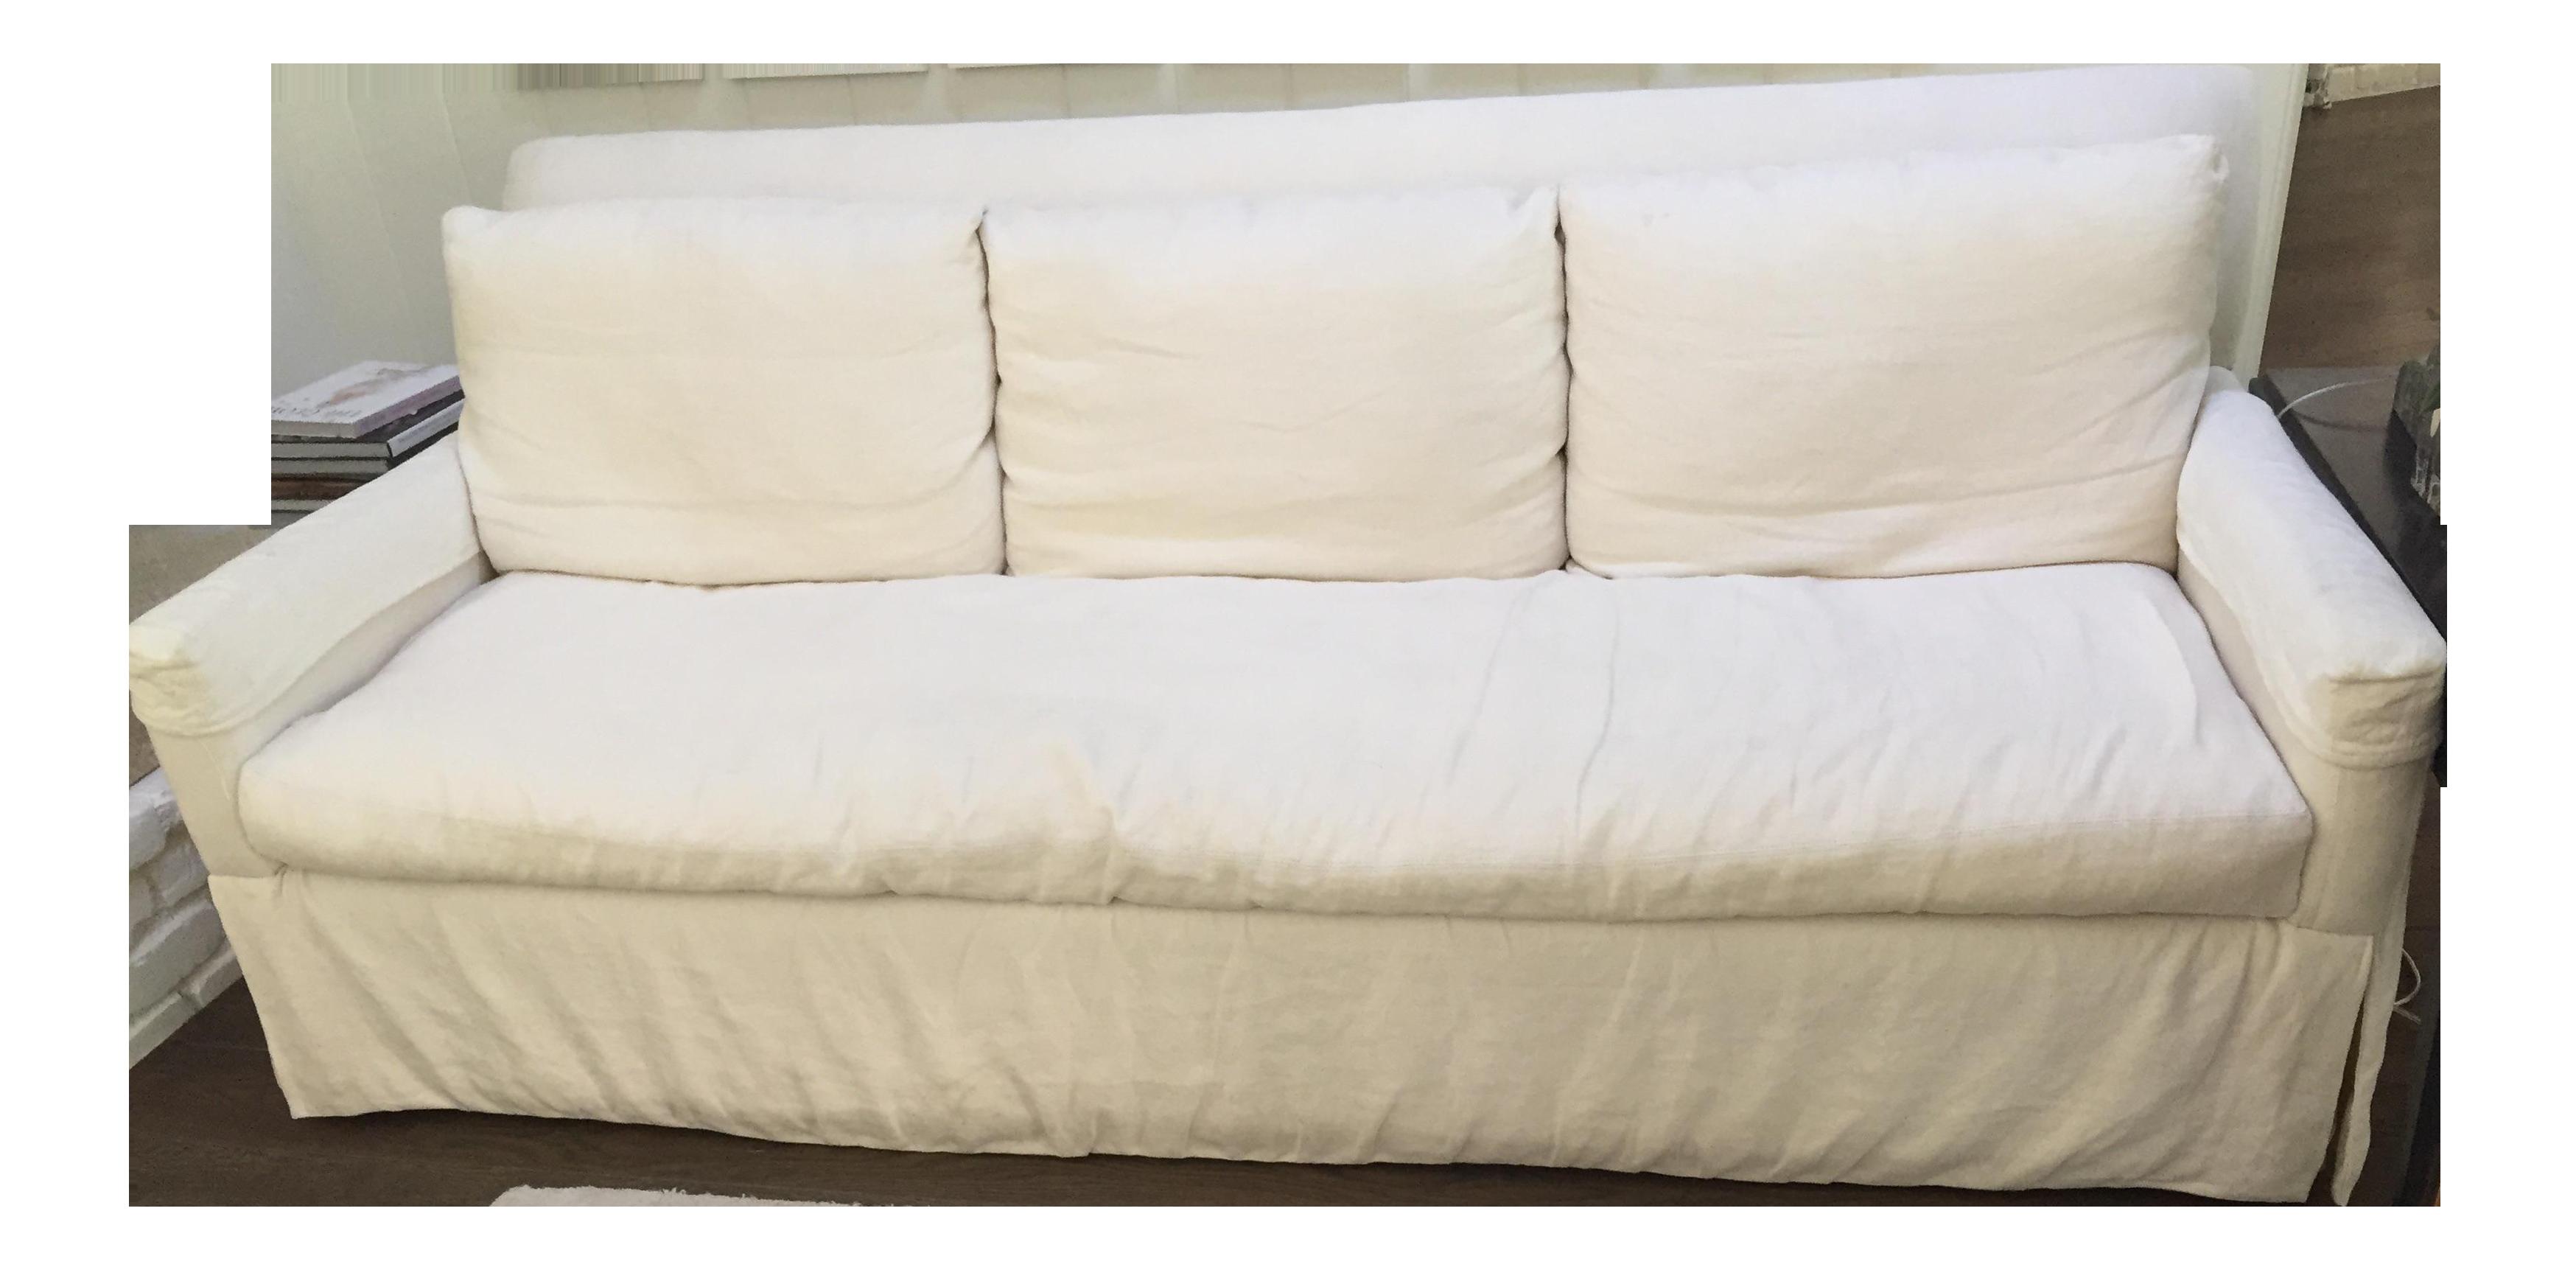 Crate & Barrel Belgian Linen Sofa